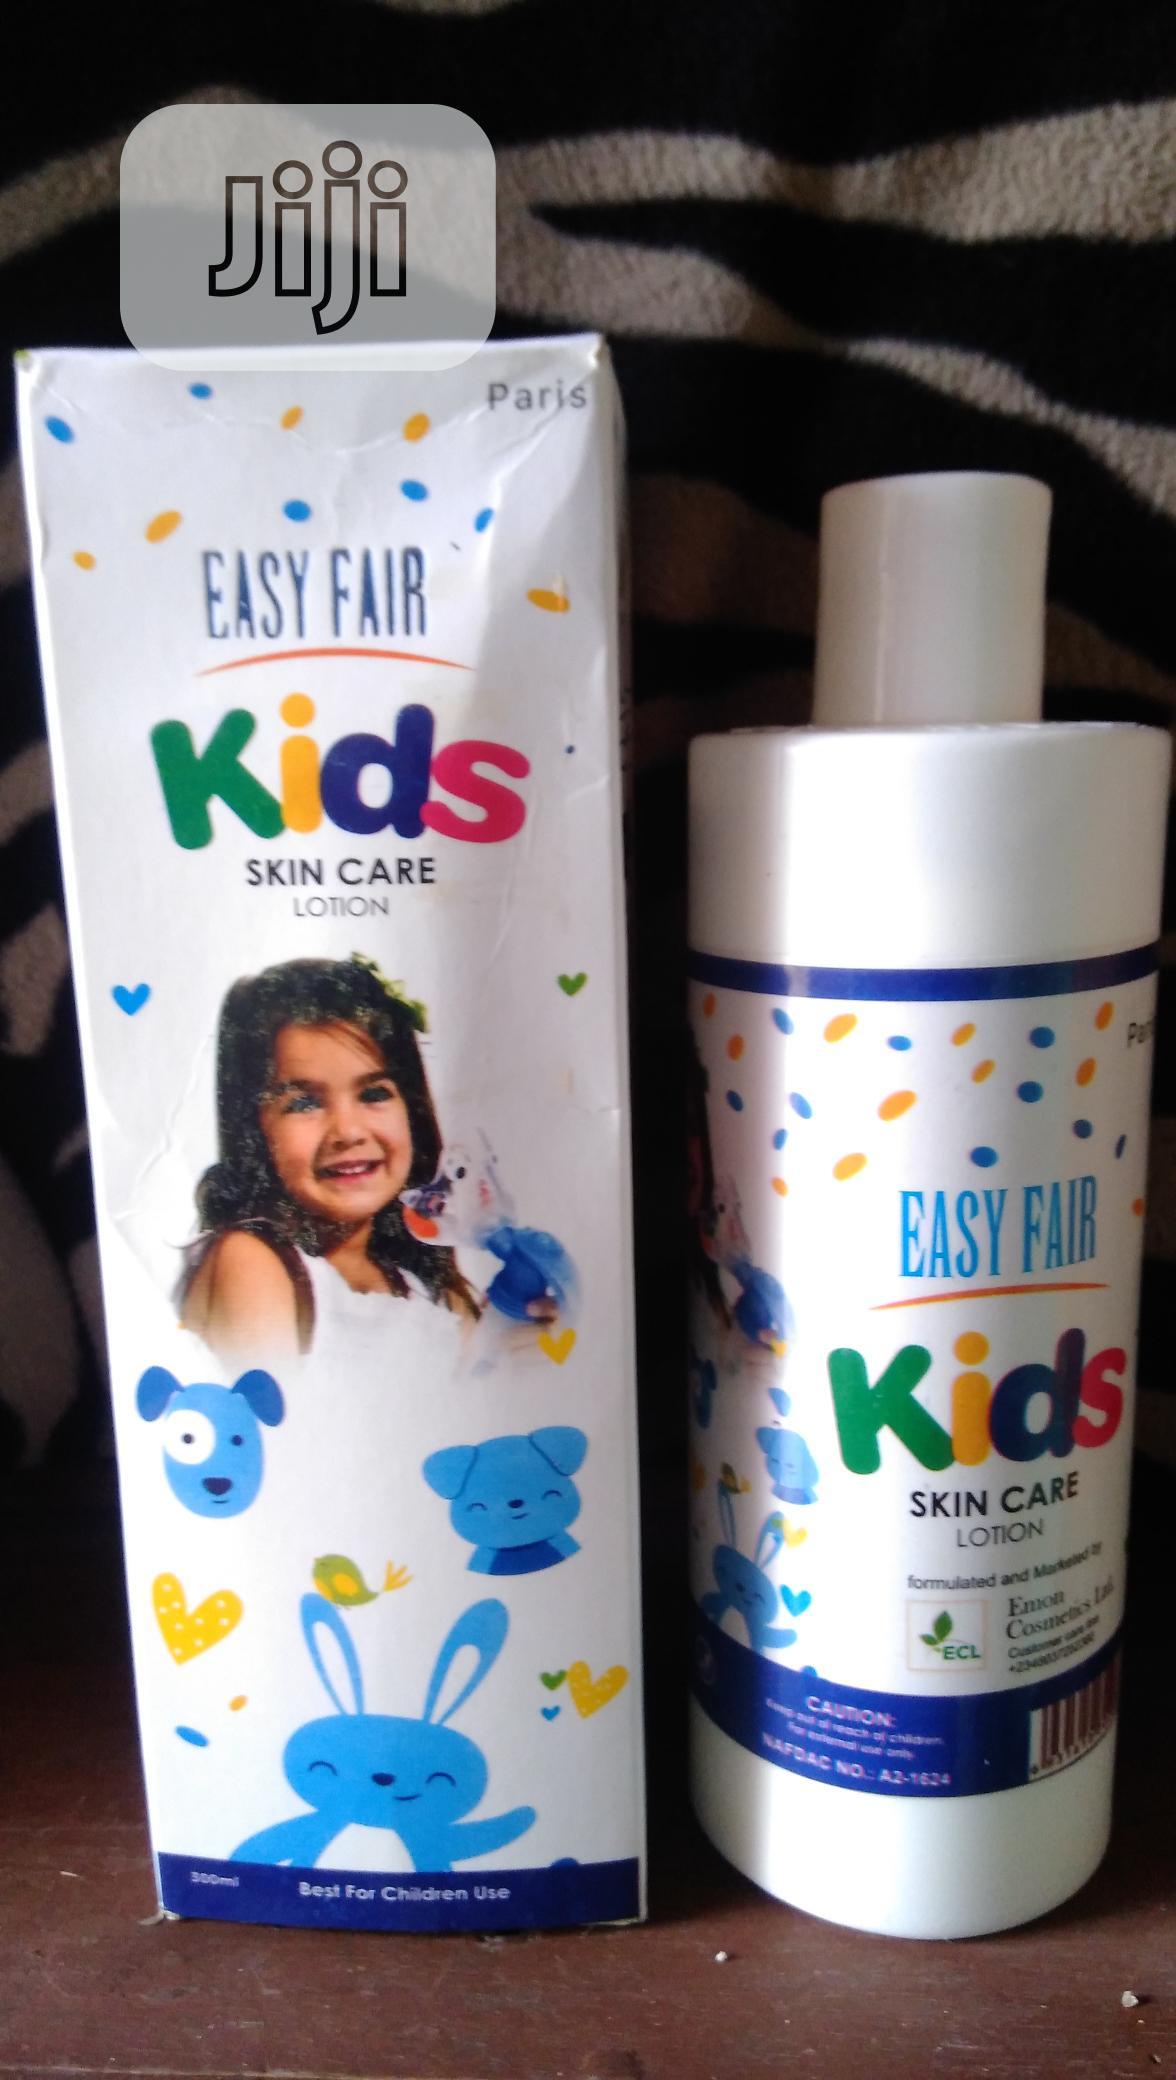 EASY FAIR Kids Skin Care Lotion